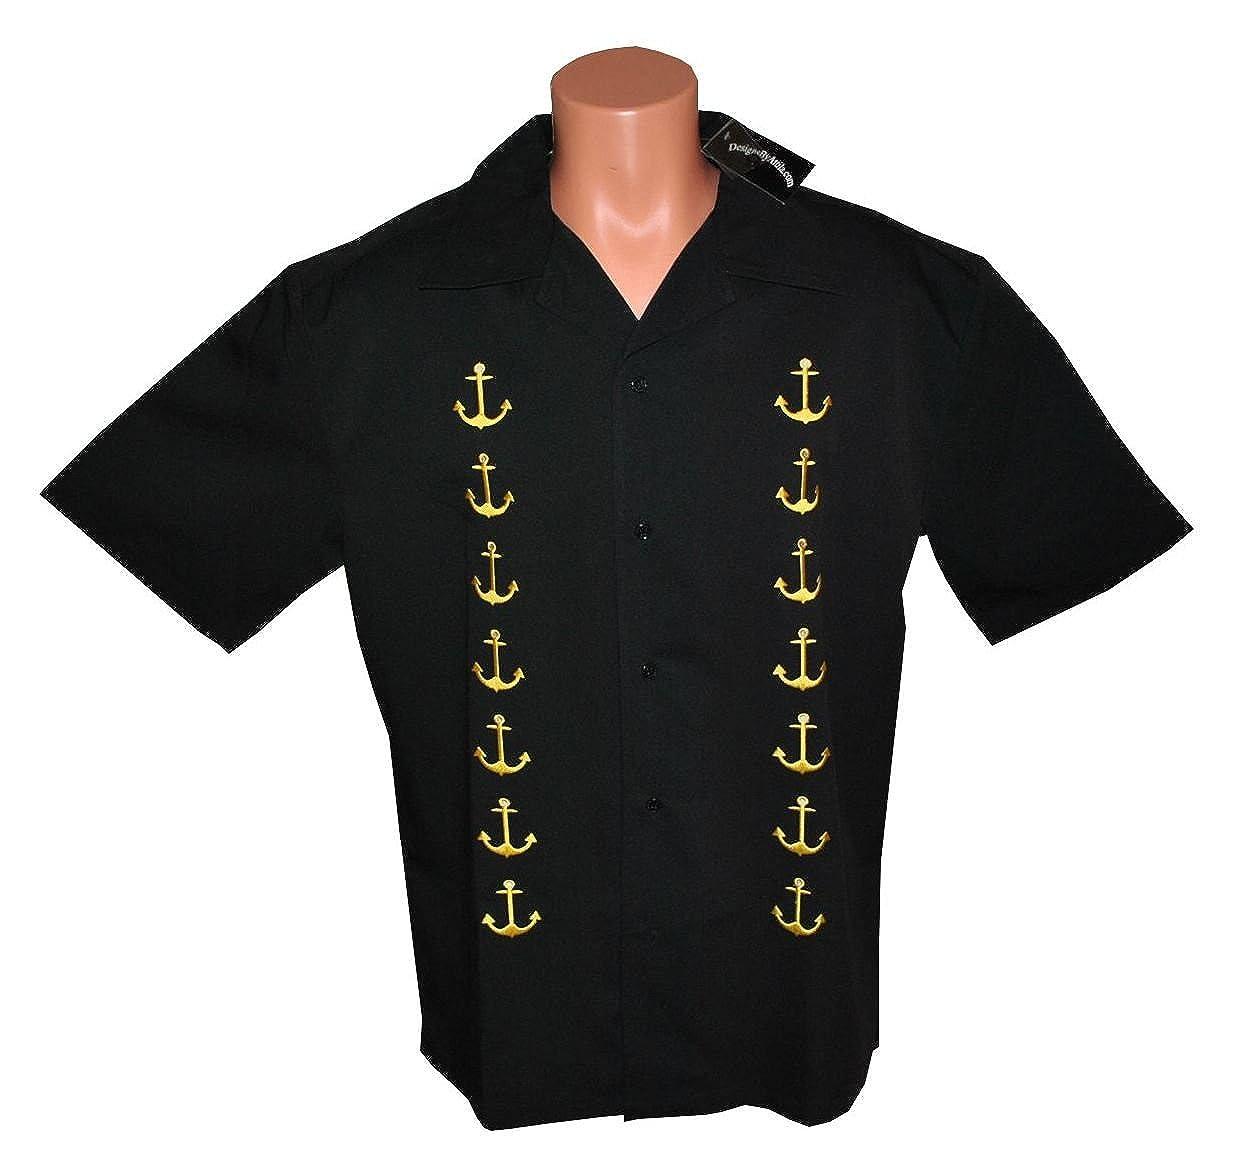 6e25274b Mens Retro Bowling Shirt, BIG & TALL. Ships Anchor Embroid